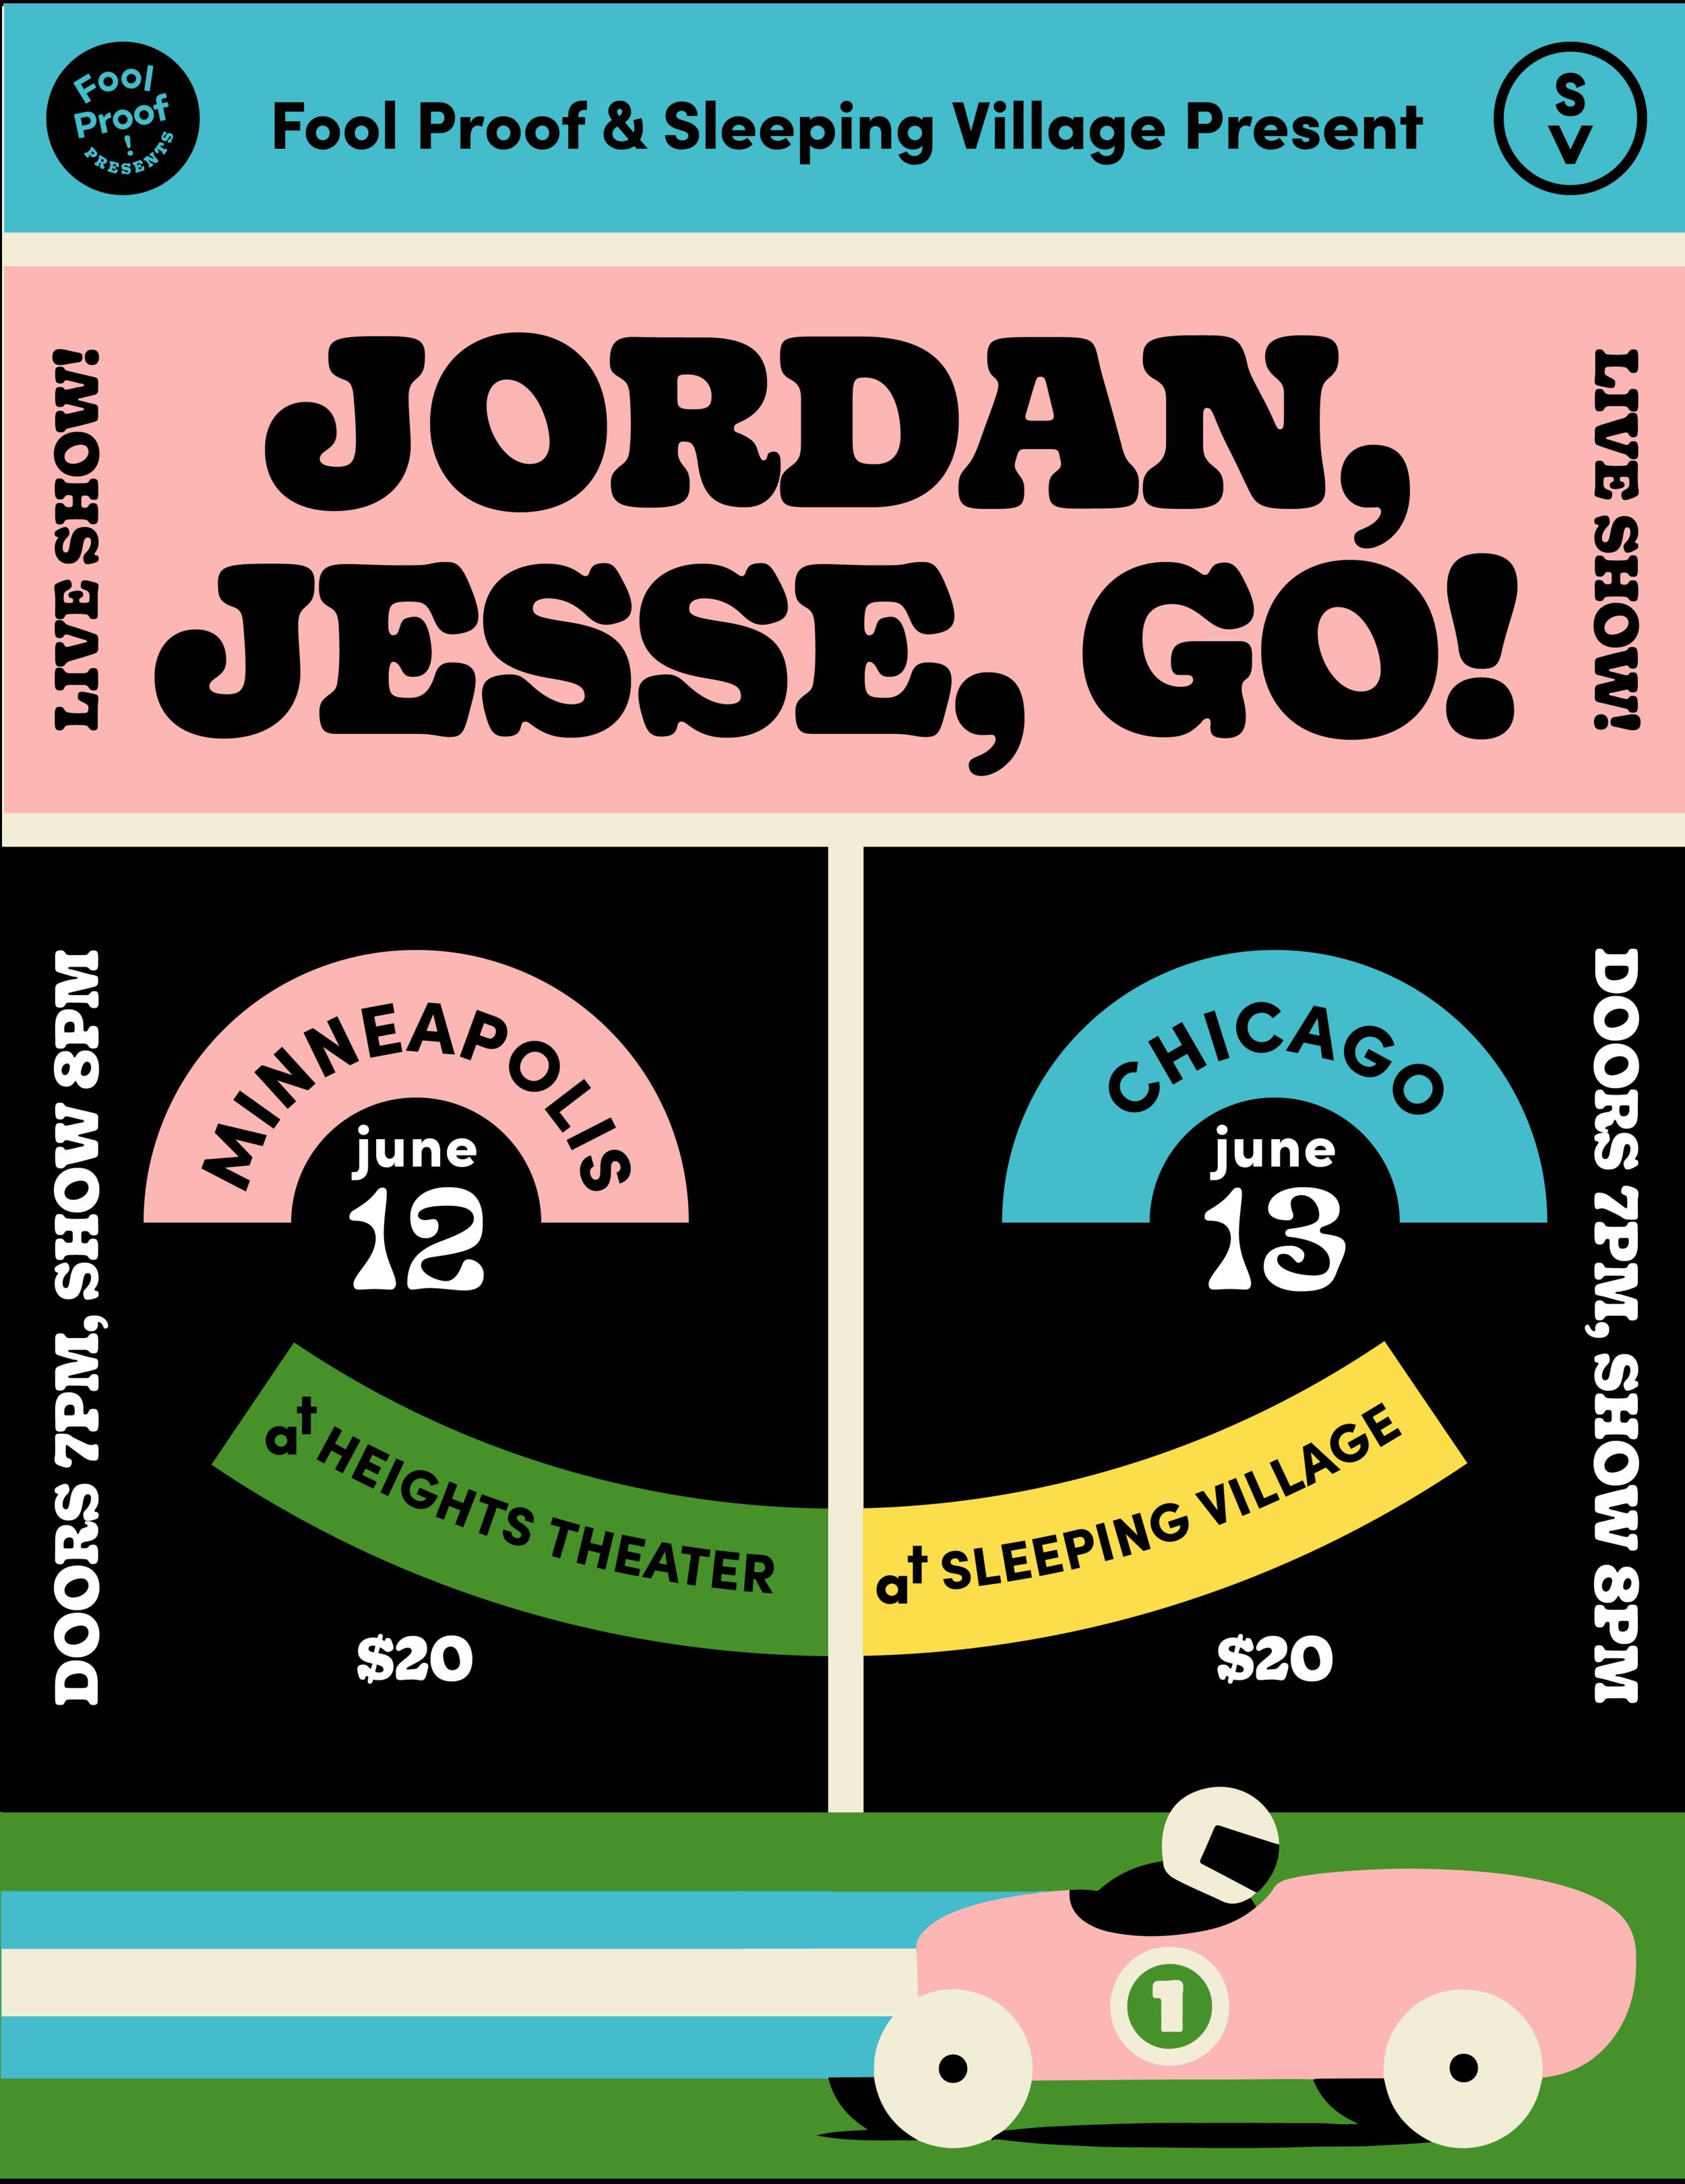 JORDAN-JESSE-GO-poster.png